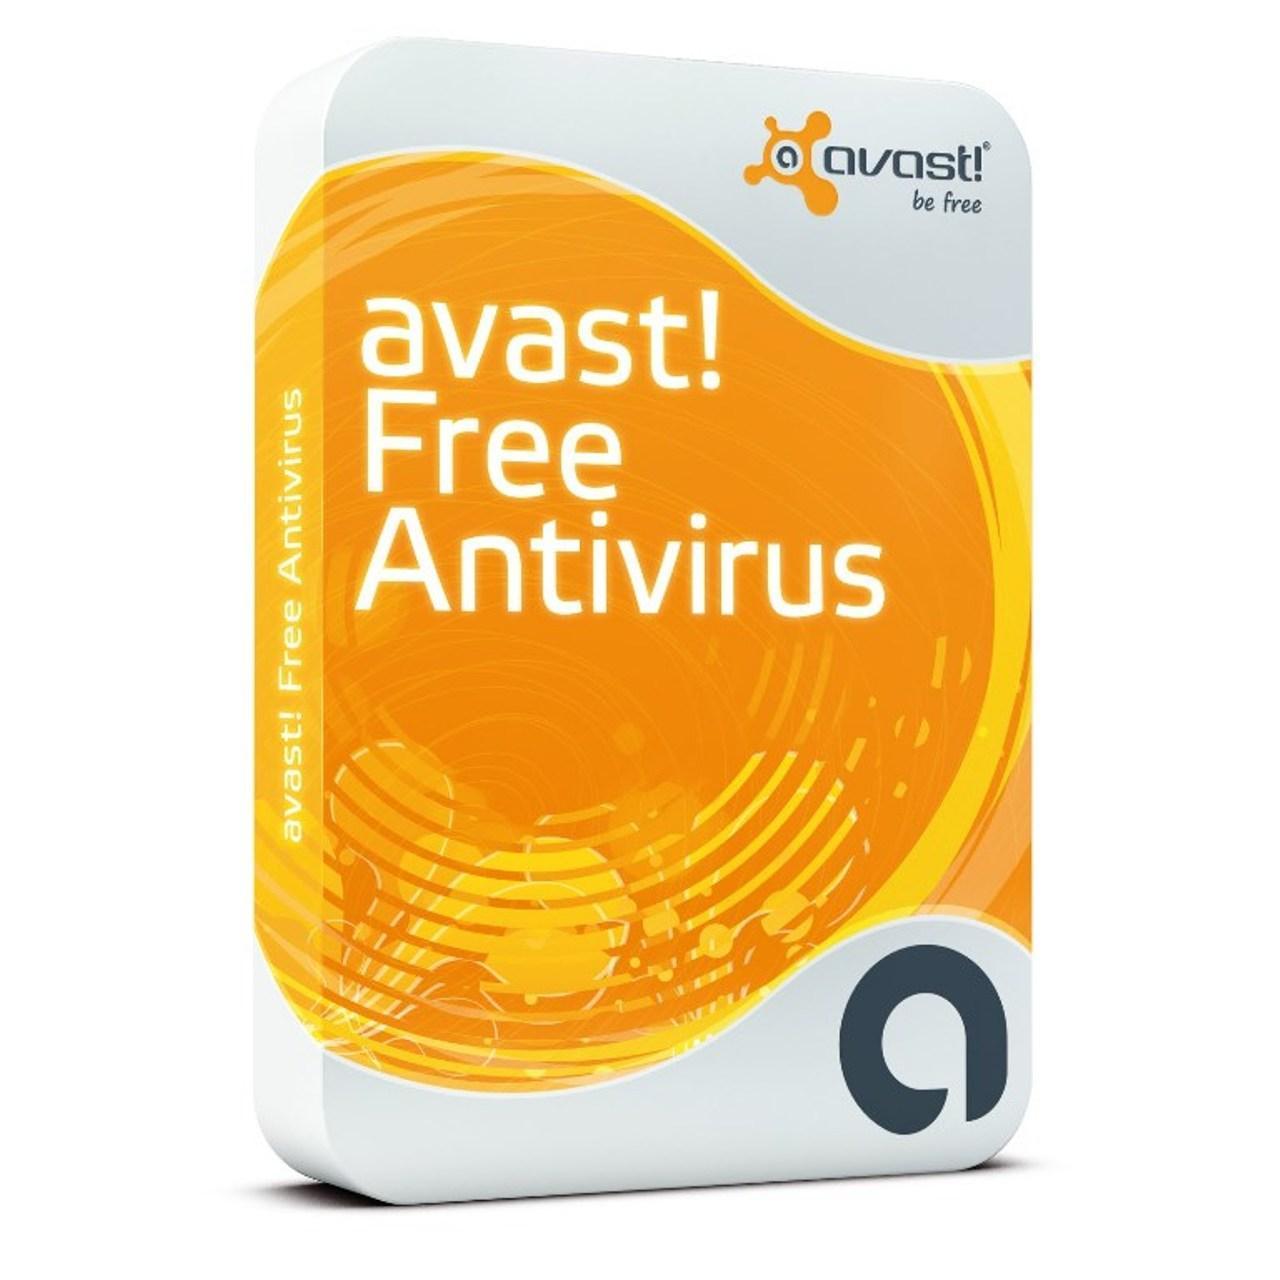 Avast! Free Edition Download avast! version 7 ตัวล่าสุด ฟรี